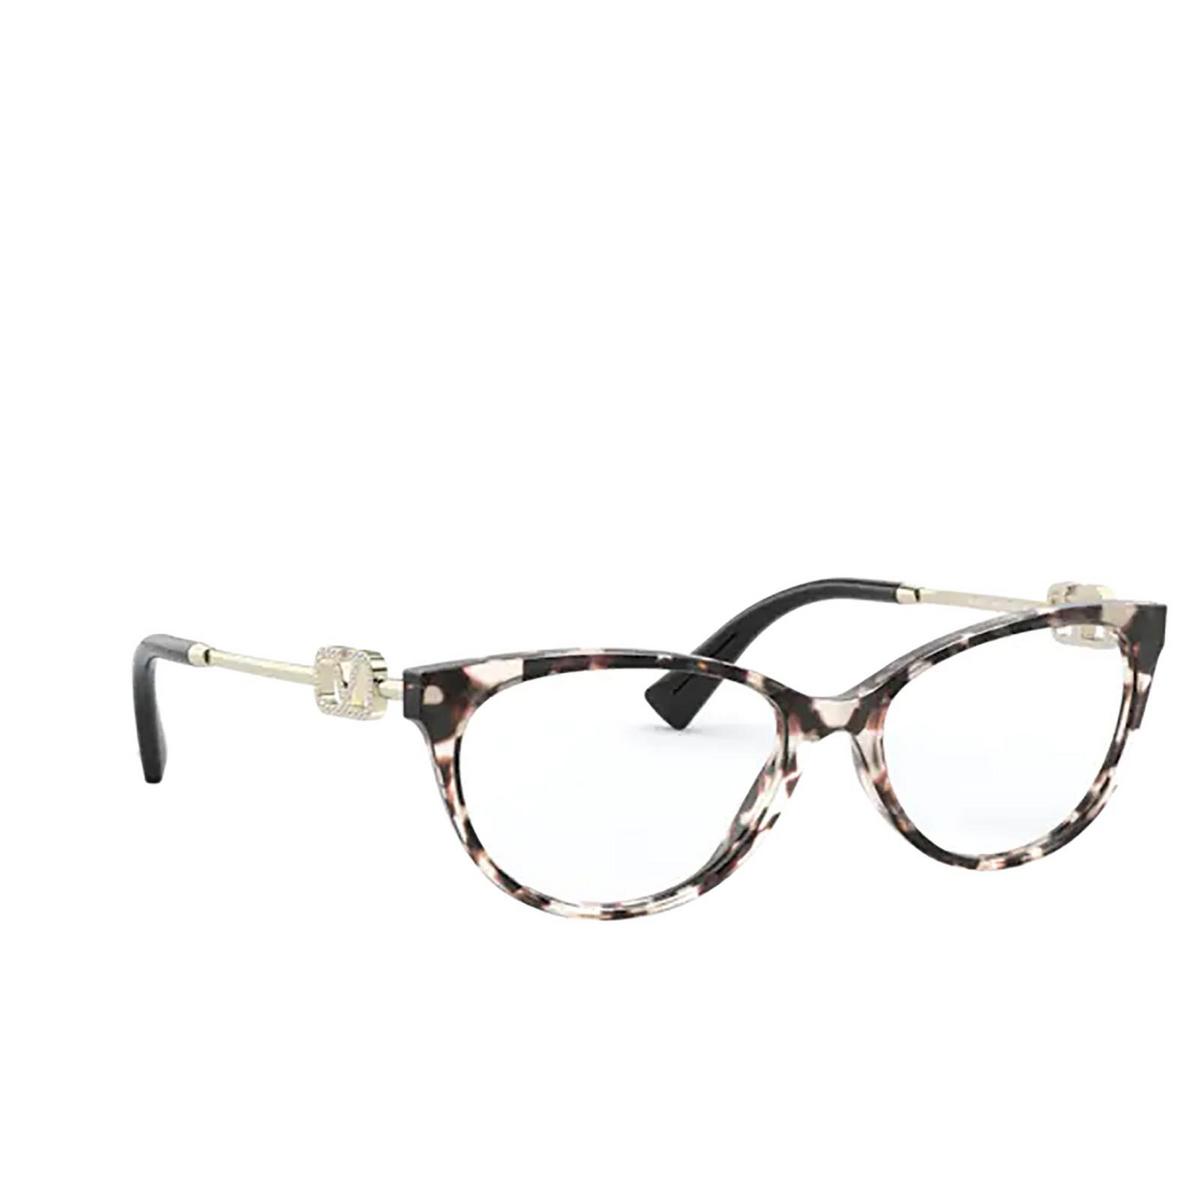 Valentino® Cat-eye Eyeglasses: VA3051 color Brown / Beige Tortoise 5097 - three-quarters view.